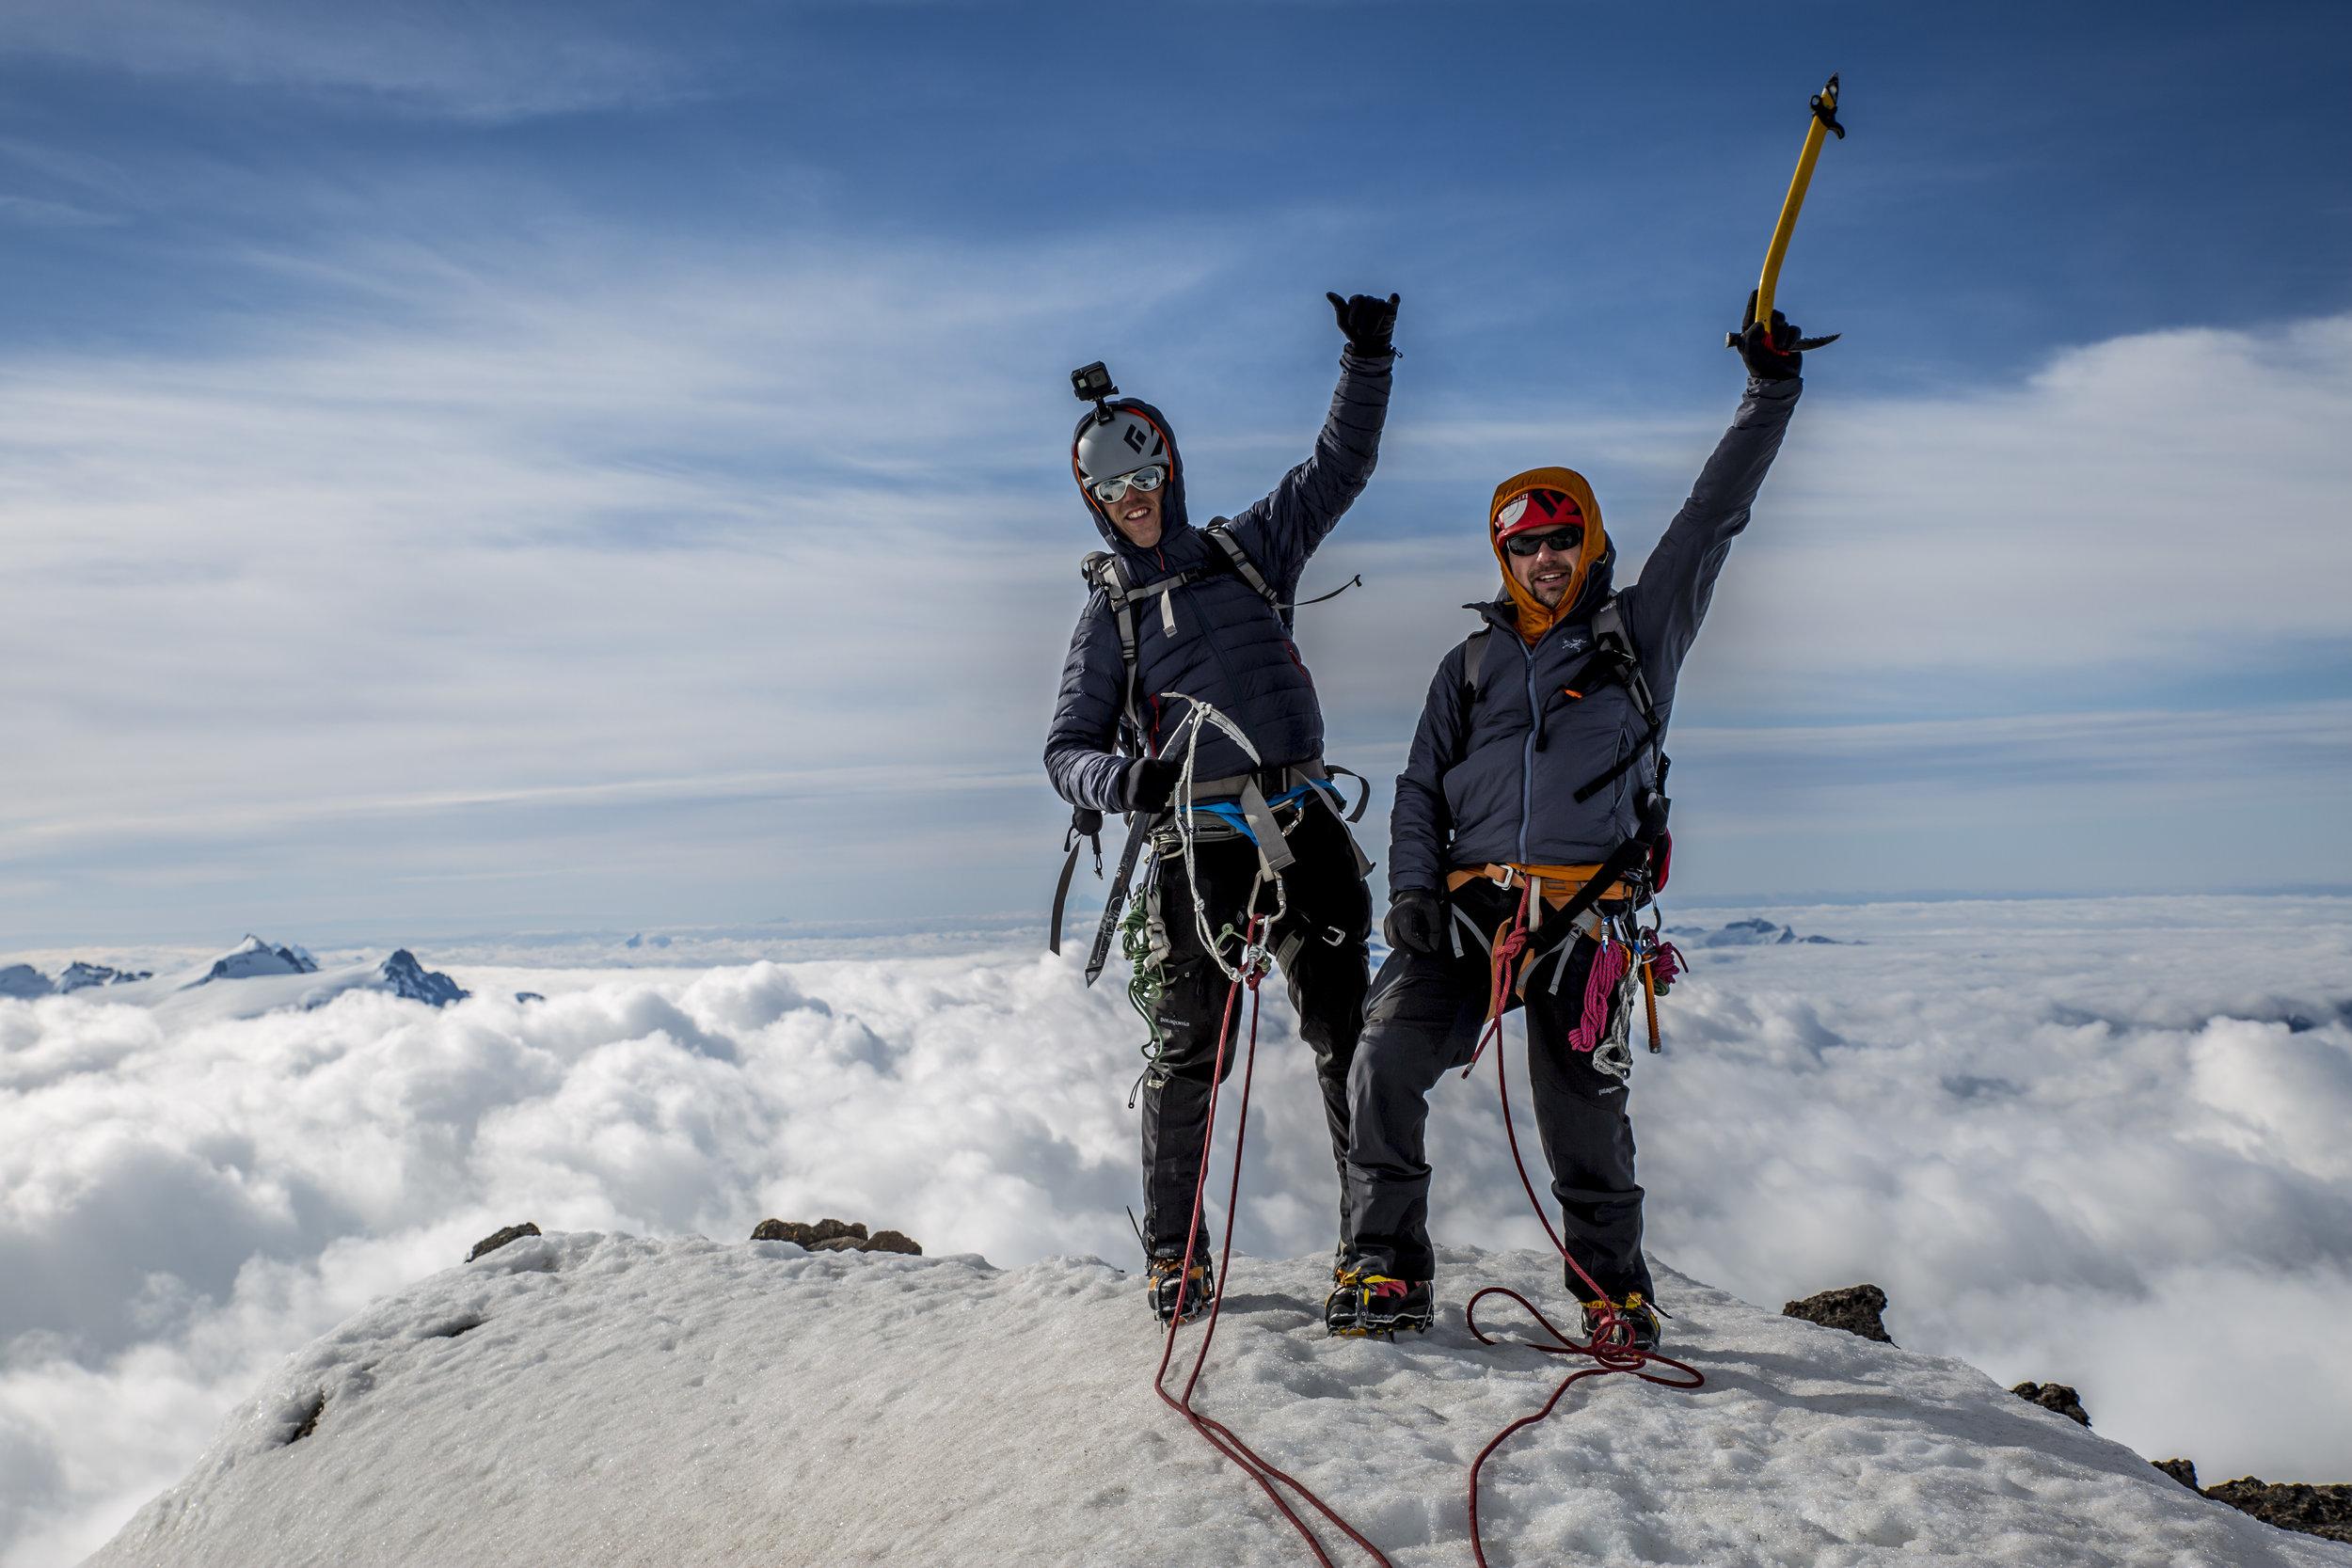 Brent left, Clayton right, on our practice climb up Mt Garibaldi in Squamish BC.